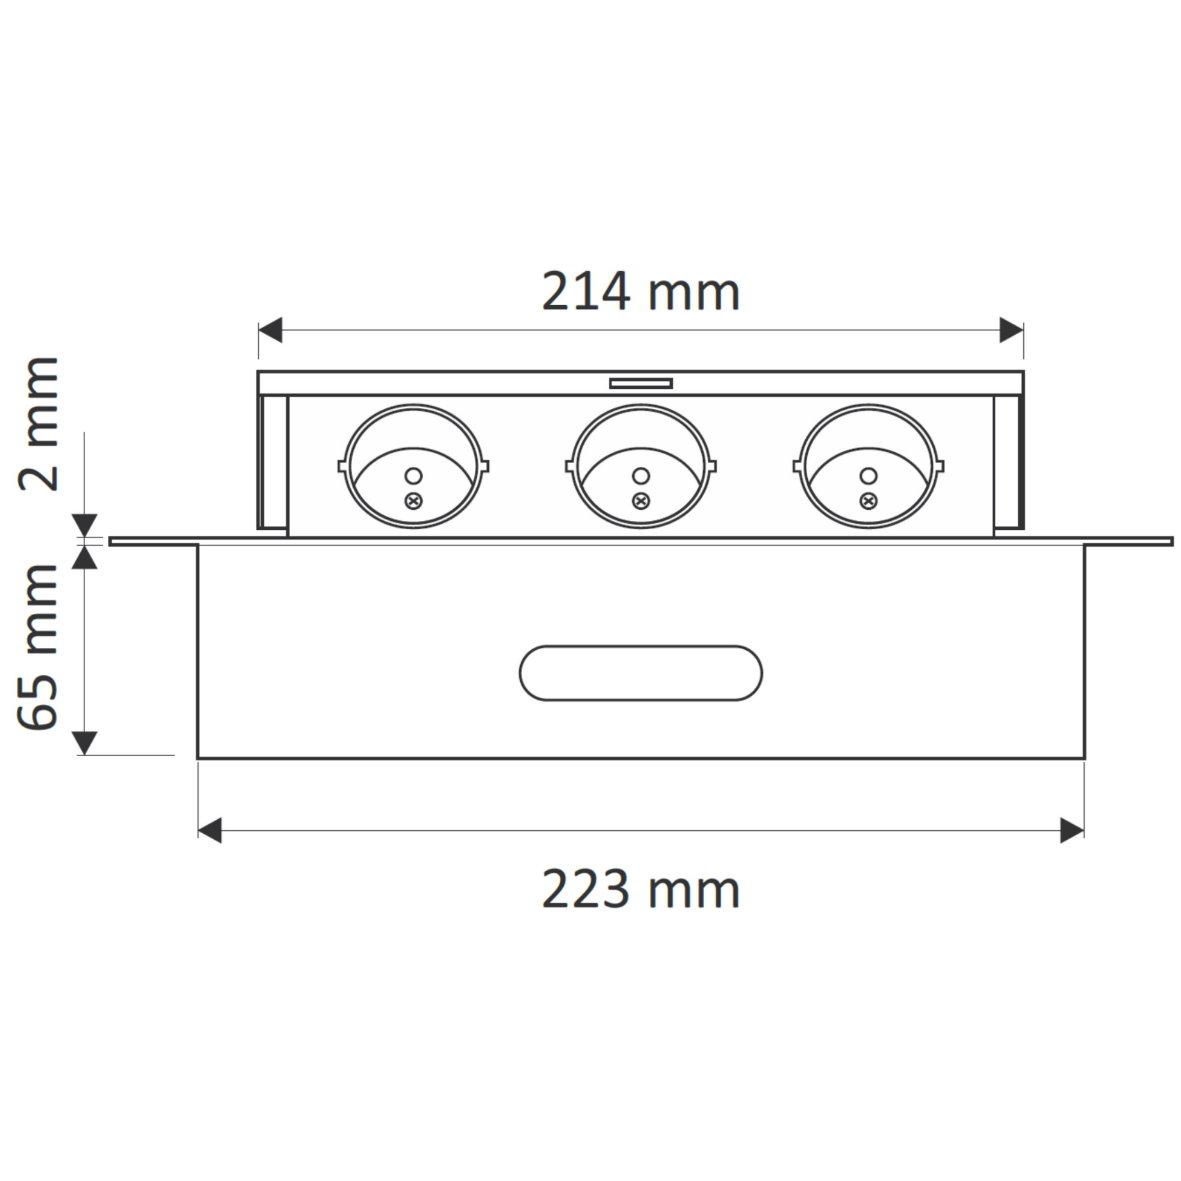 Versenkbare aluminium einbausteckdose 3 fach schwarz for Design artikel shop